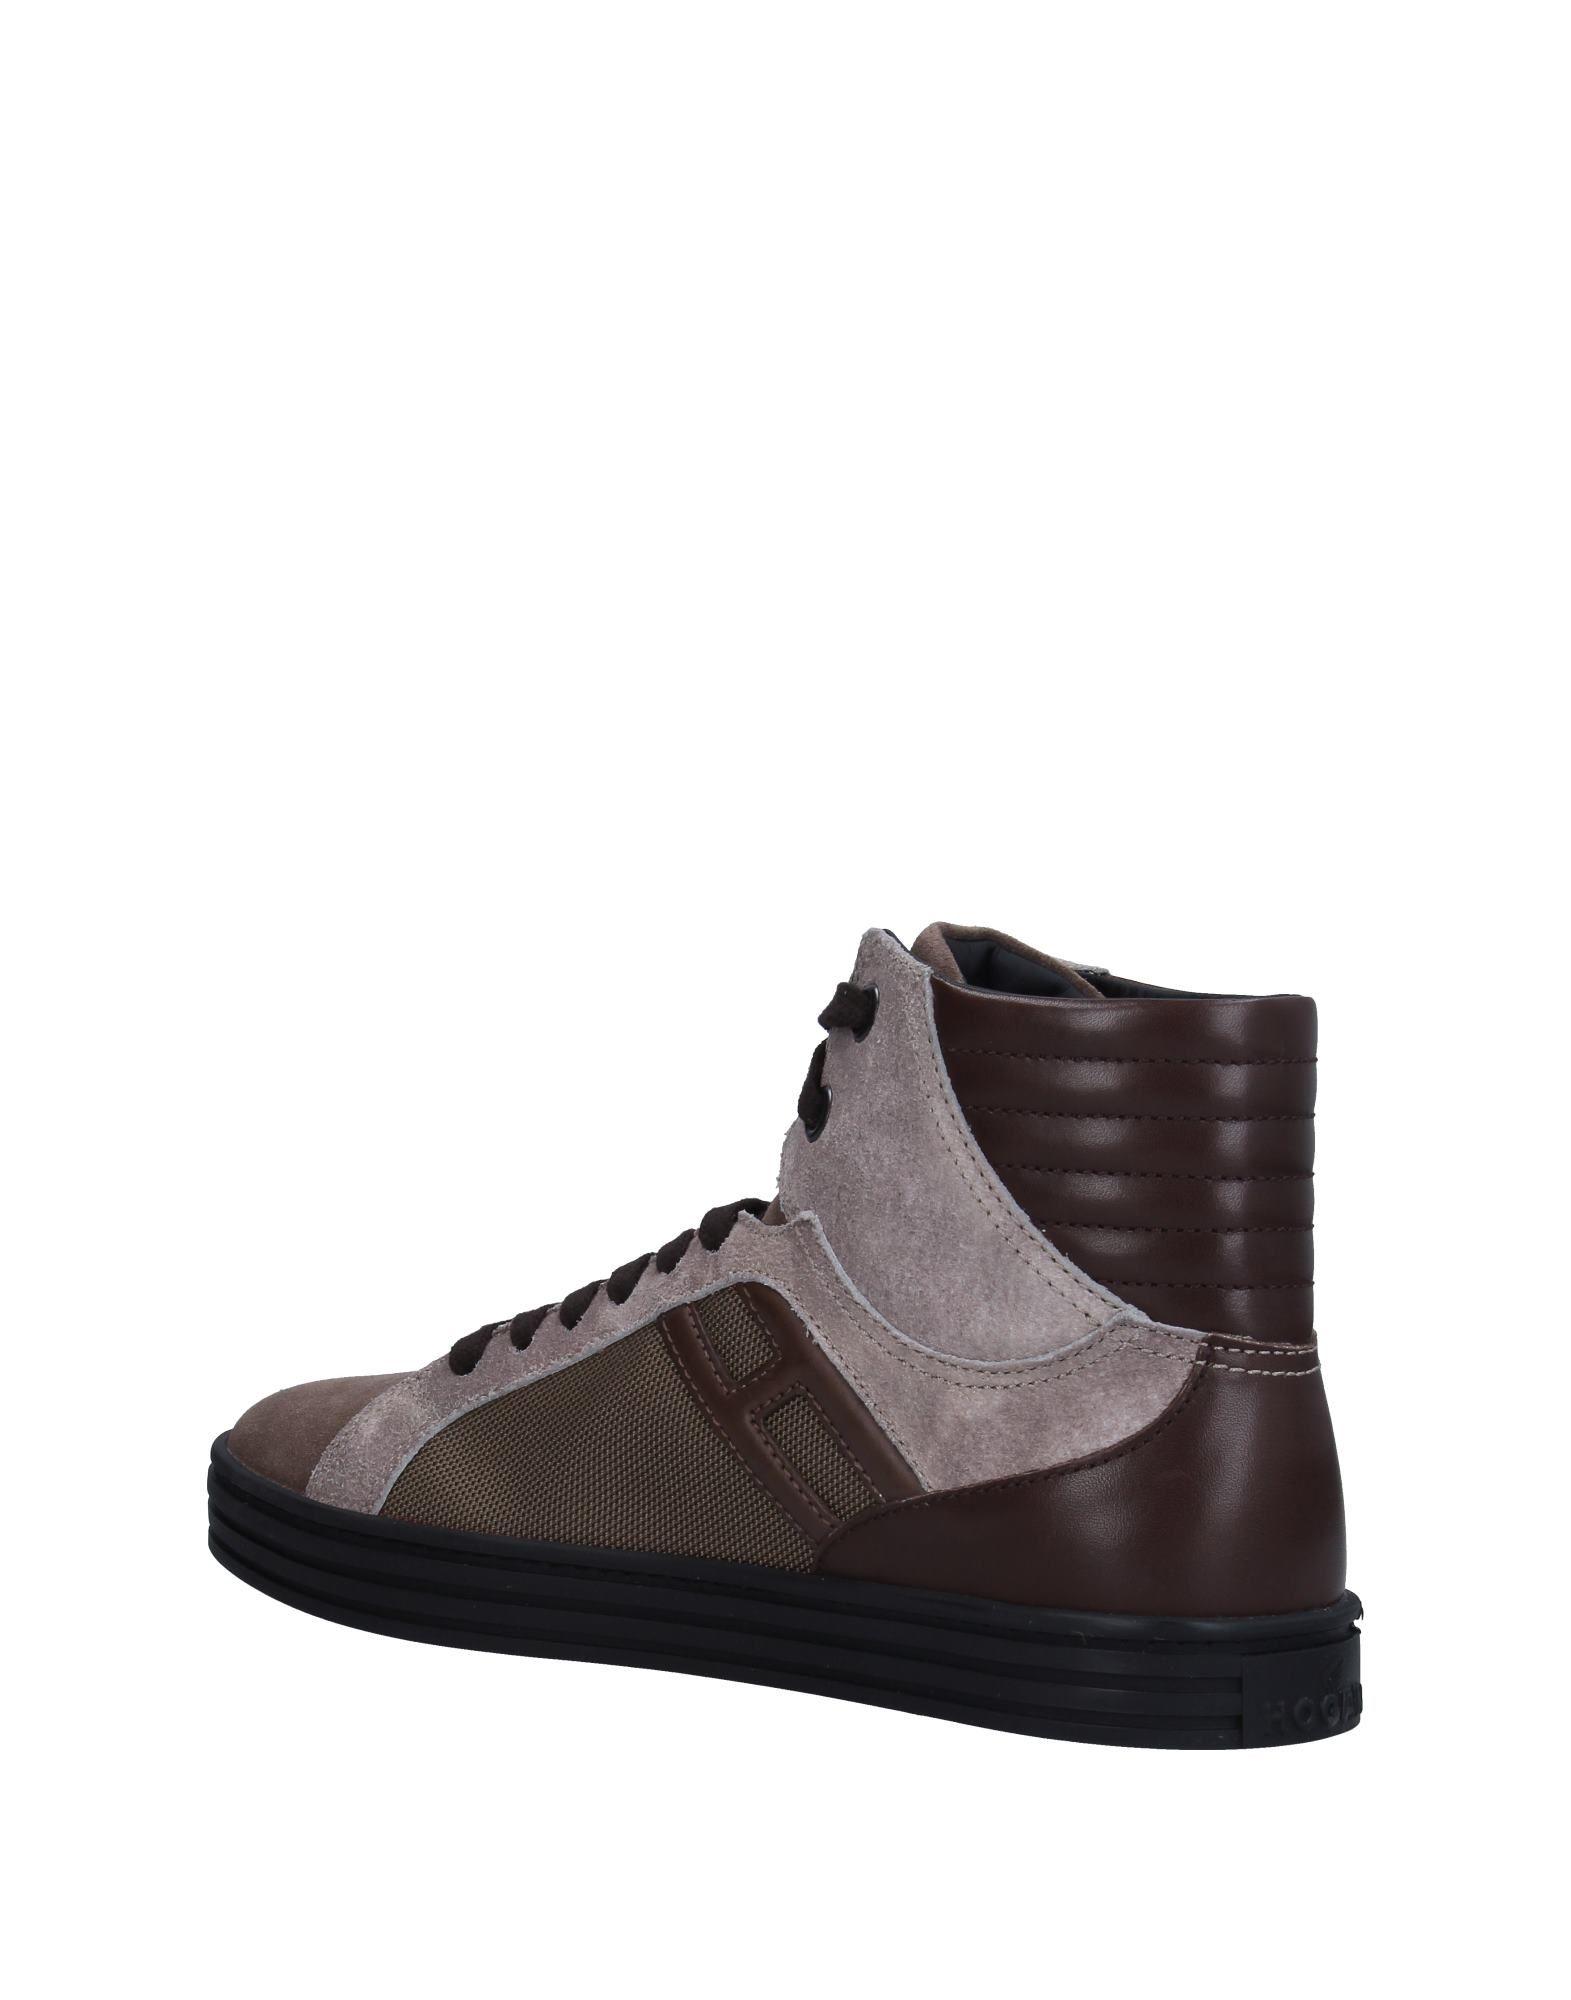 Hogan Rebel Sneakers Herren  11288861CJ 11288861CJ  37d2bc